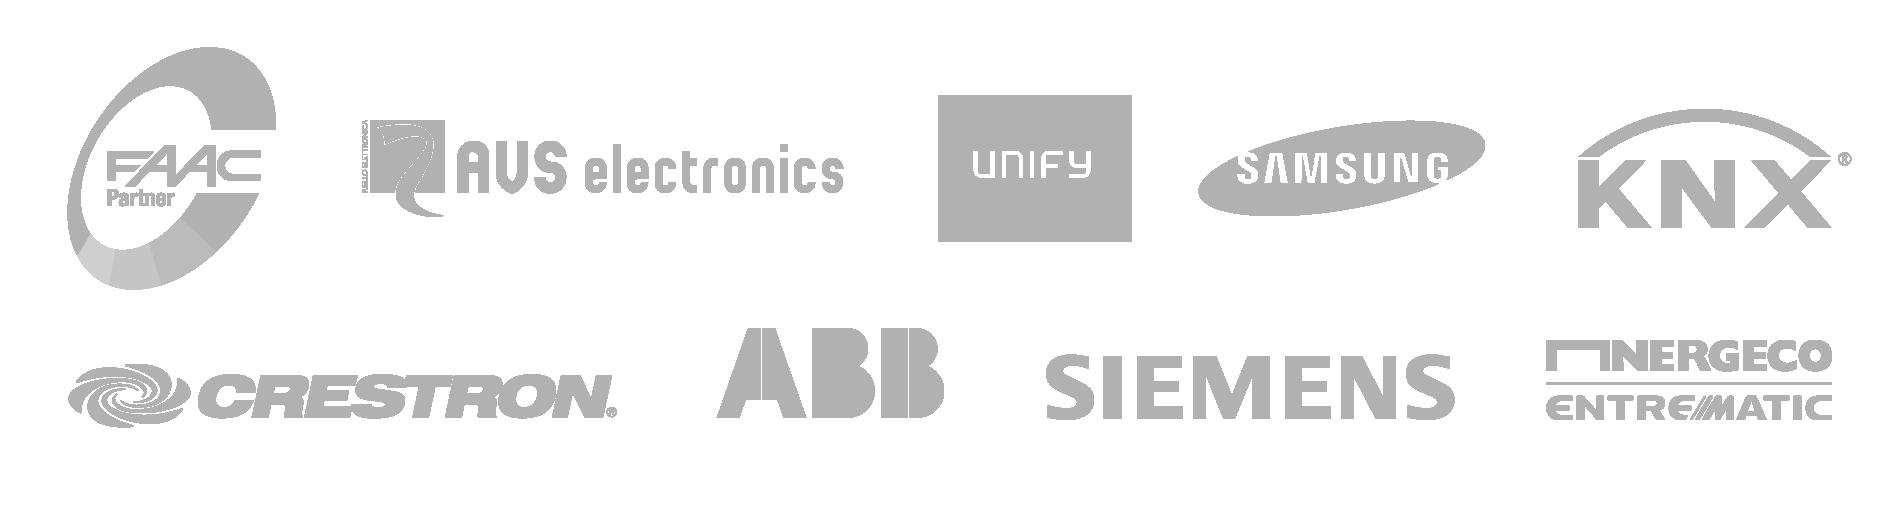 dago elettronica partners